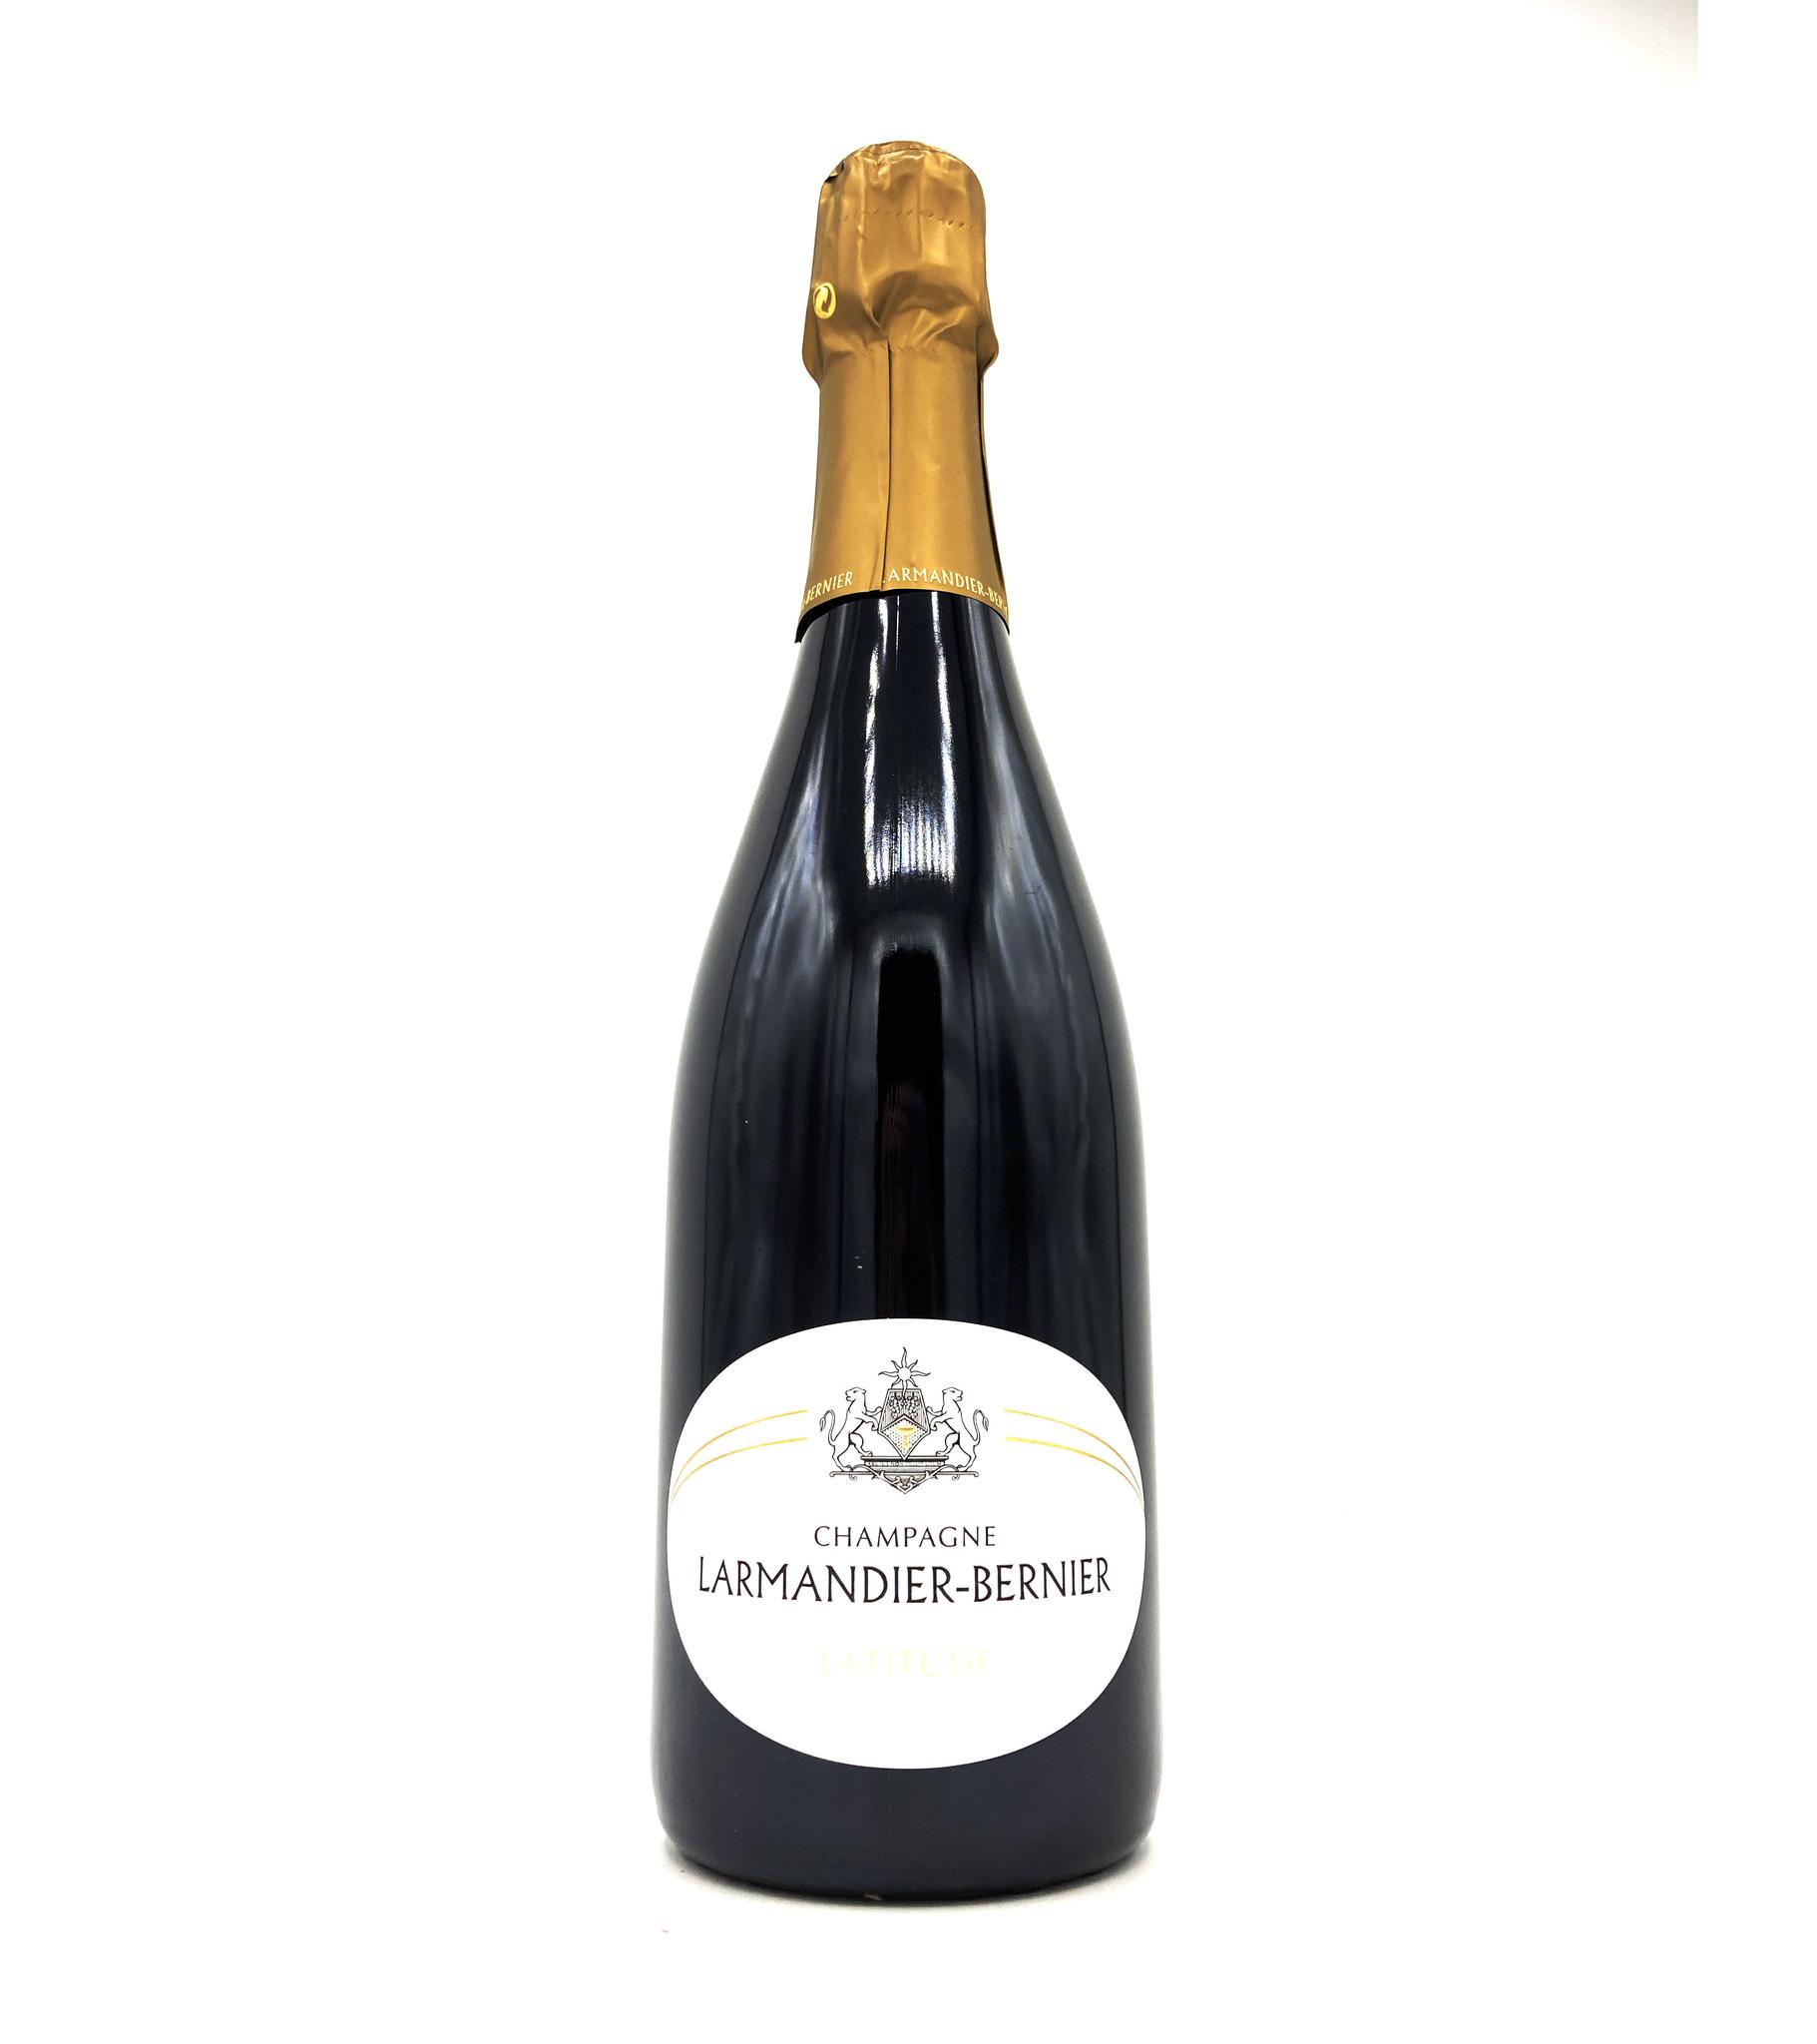 Champagne Extra Brut Latitude NV Larmandier-Bernier